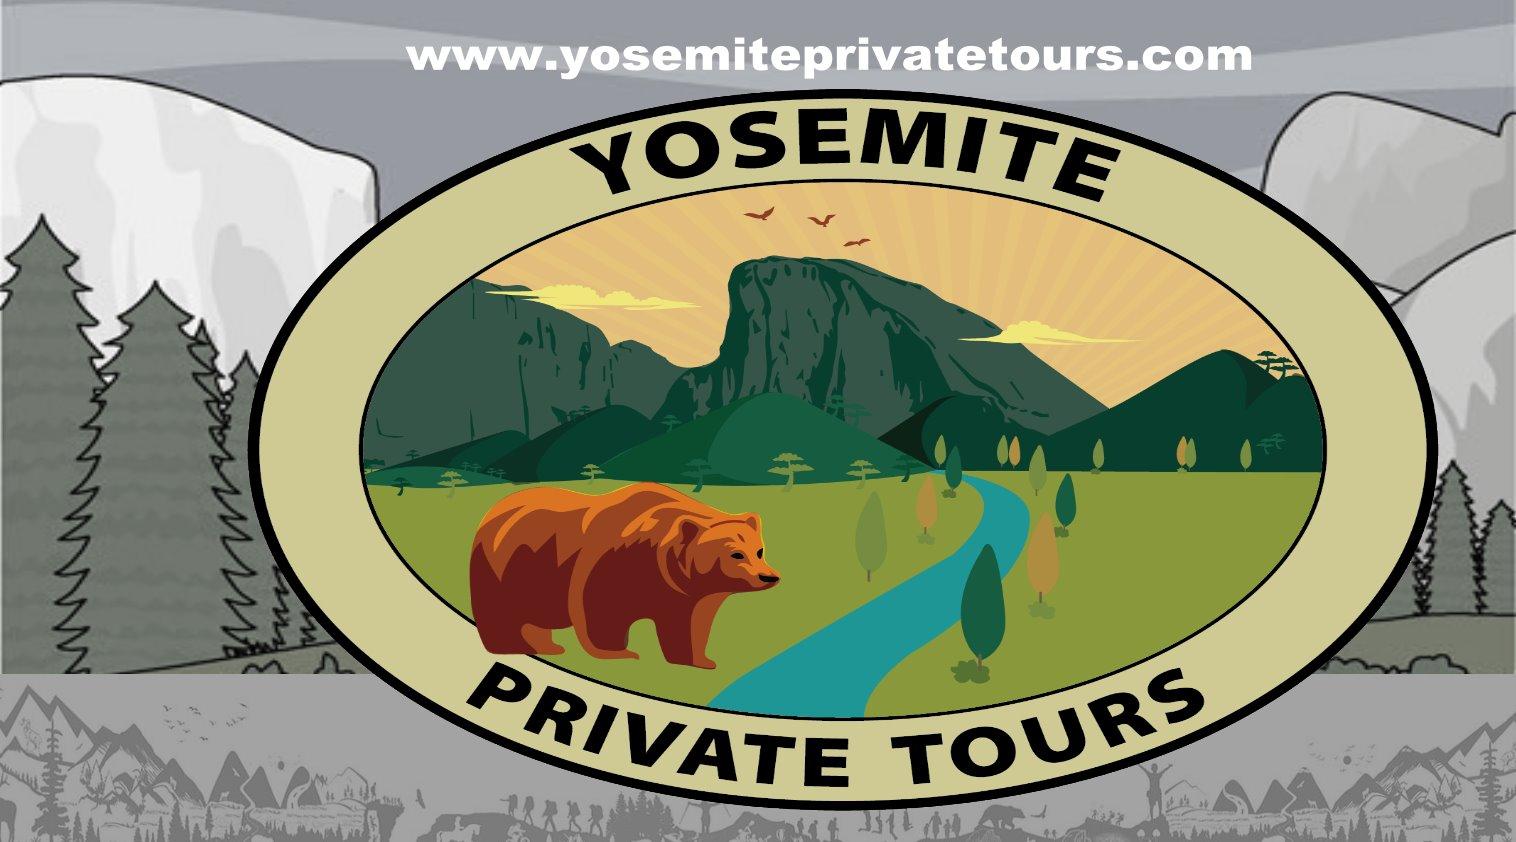 Yosemite Private Tours - amusement park  | Photo 1 of 4 | Address: 101 California St, San Francisco, CA 94111 | Phone: (209) 888-1141